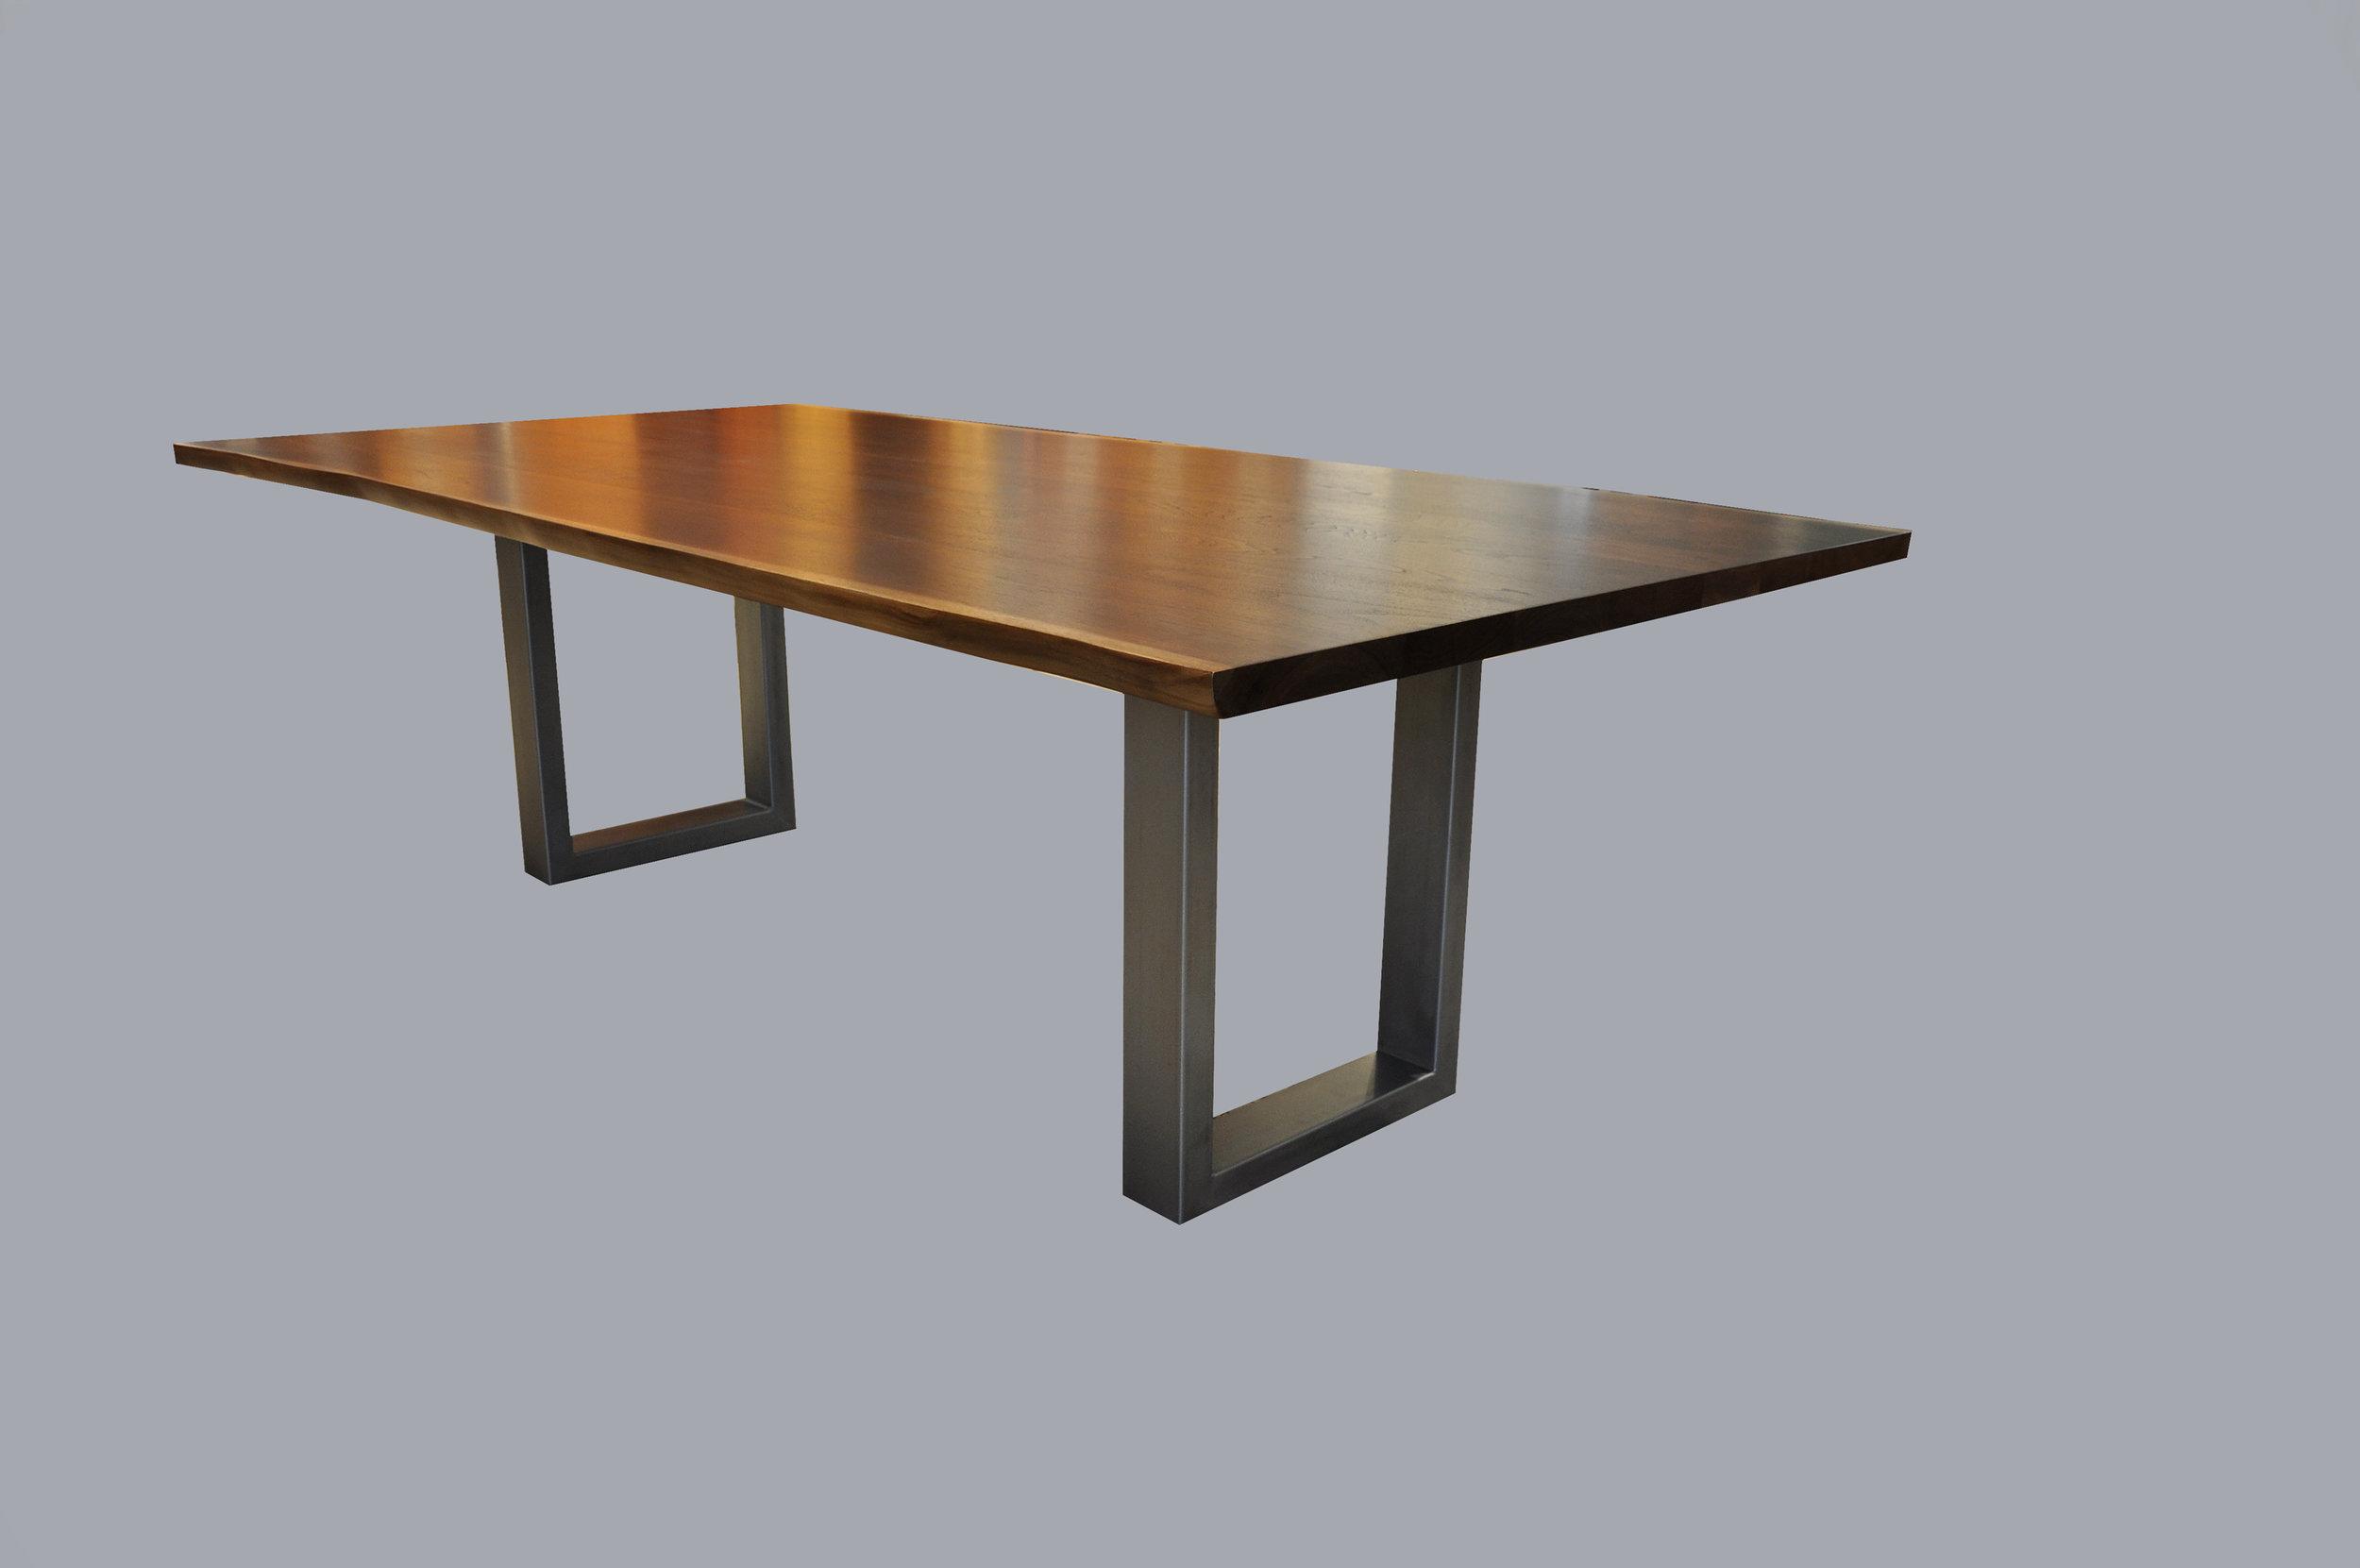 Draper Table Base